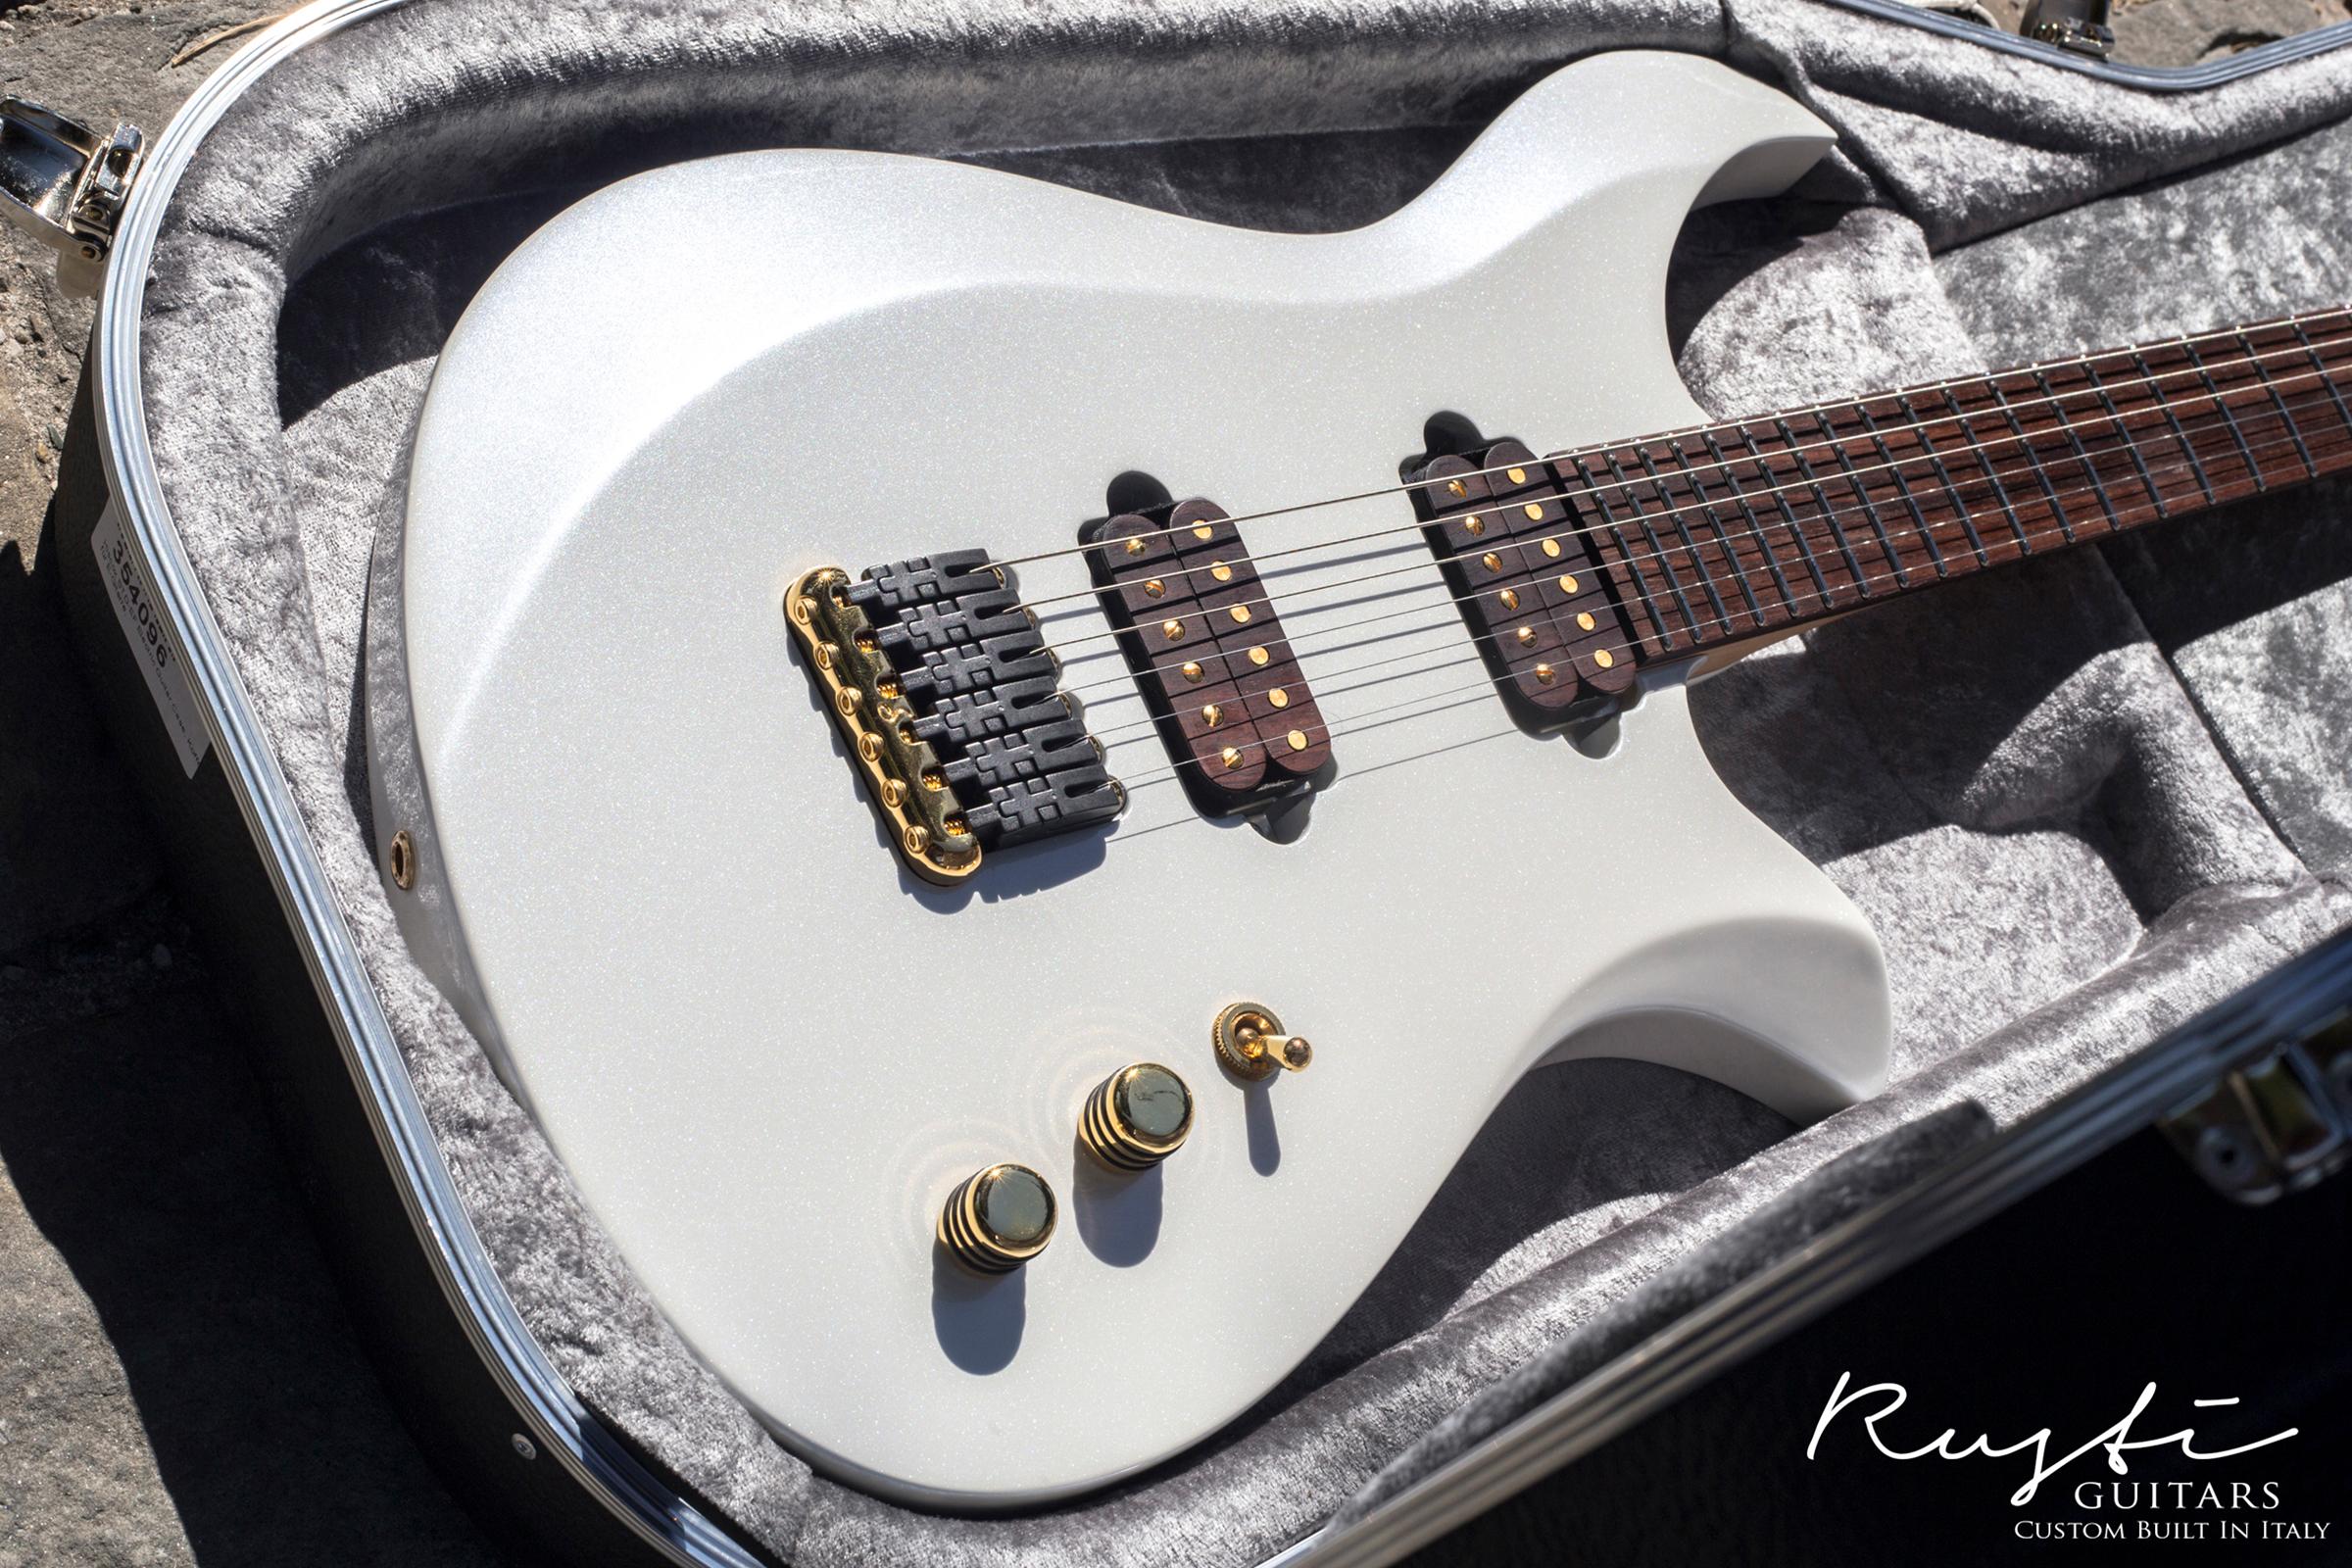 Rusti Guitars_Motion1_News01c